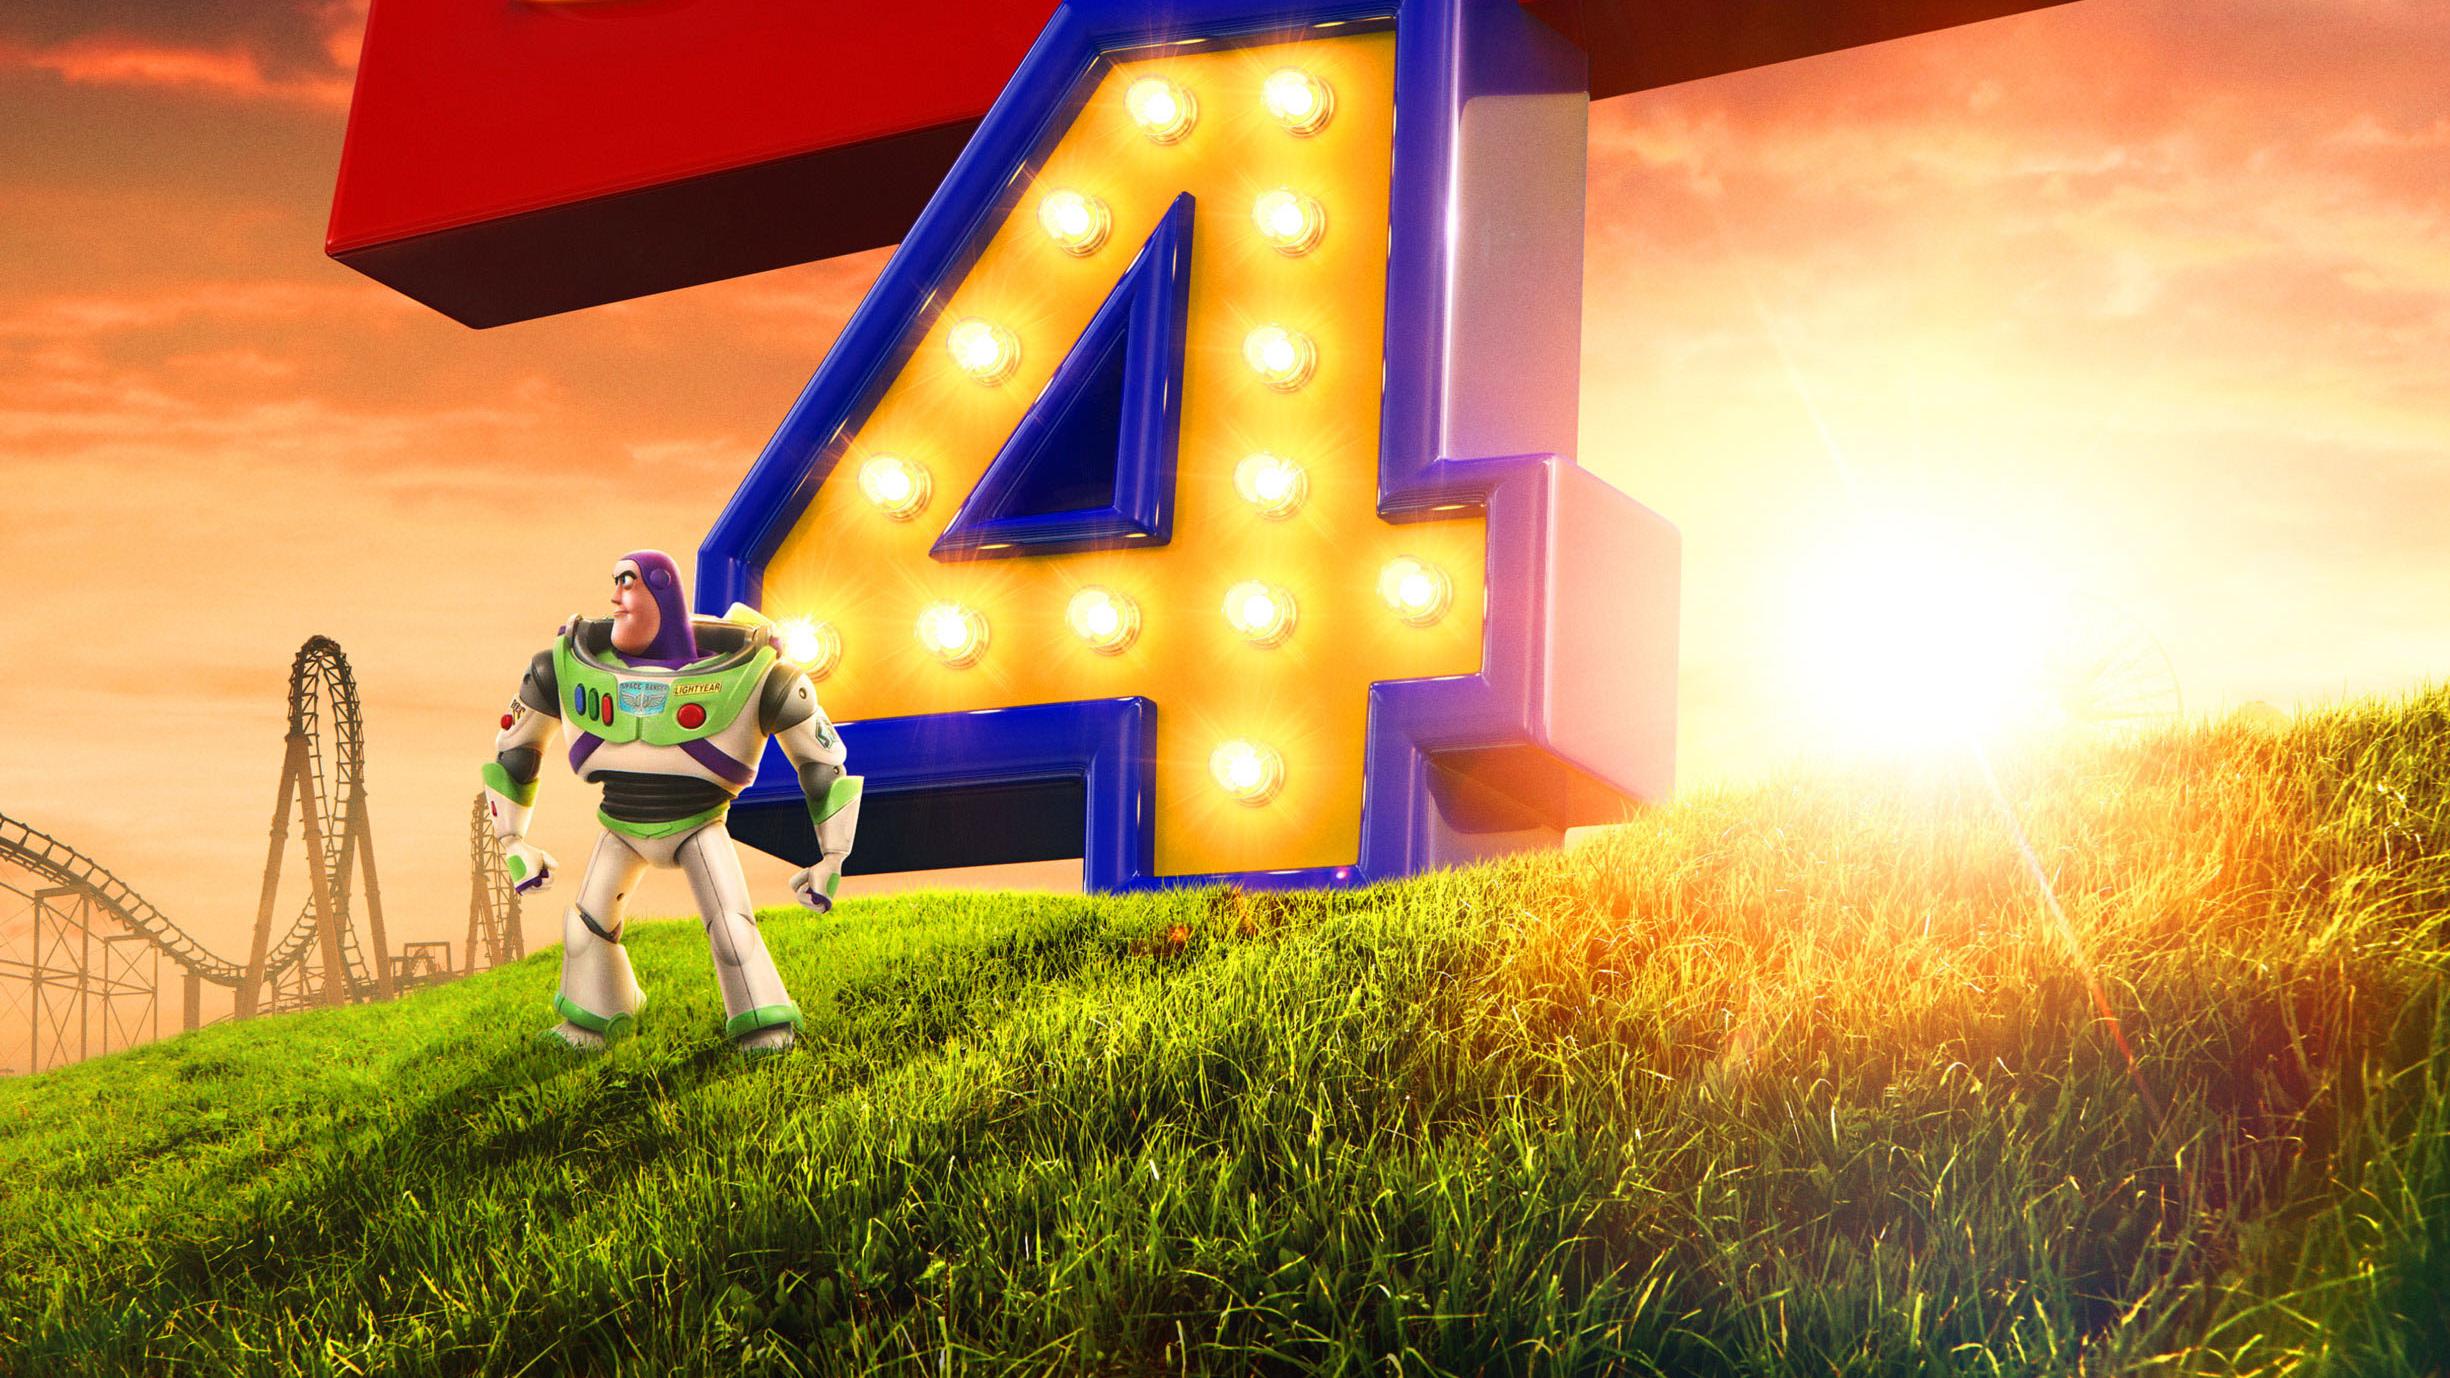 Buzz Lightyear In Toy Story 4 2019, HD Movies, 4k ...